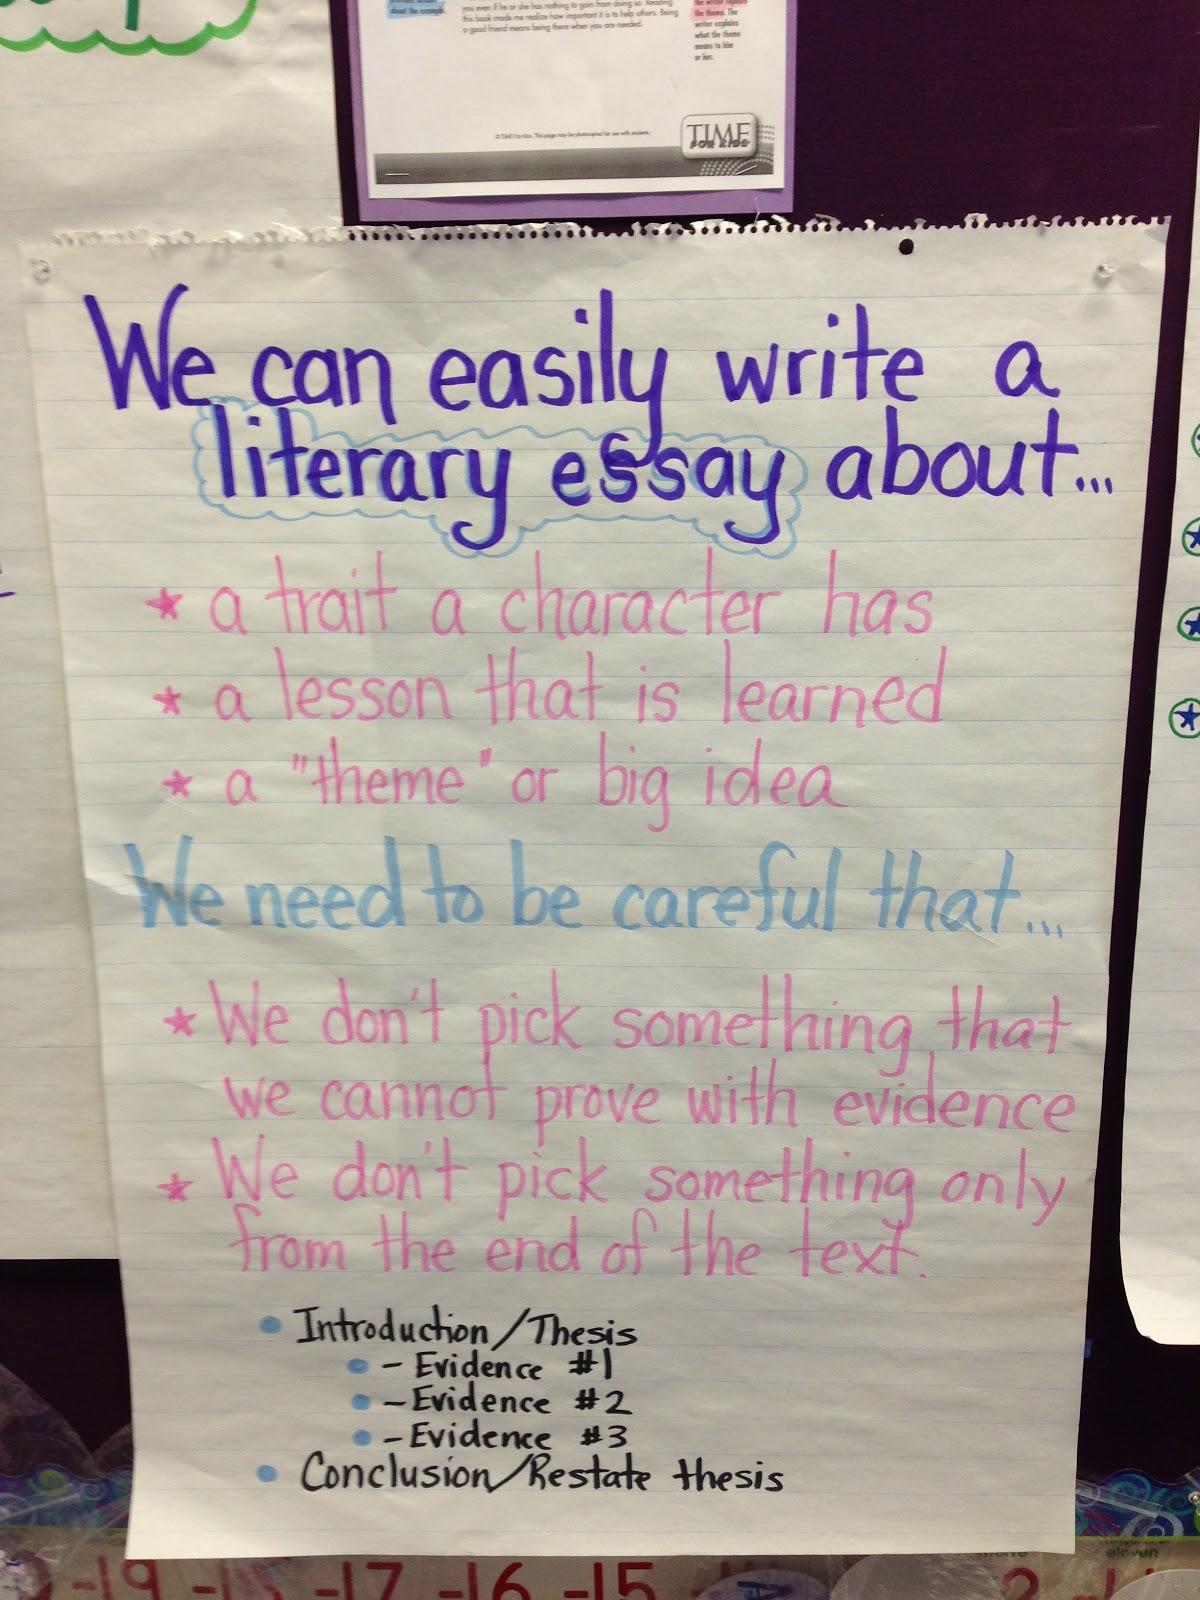 Definition Of Literary Essay